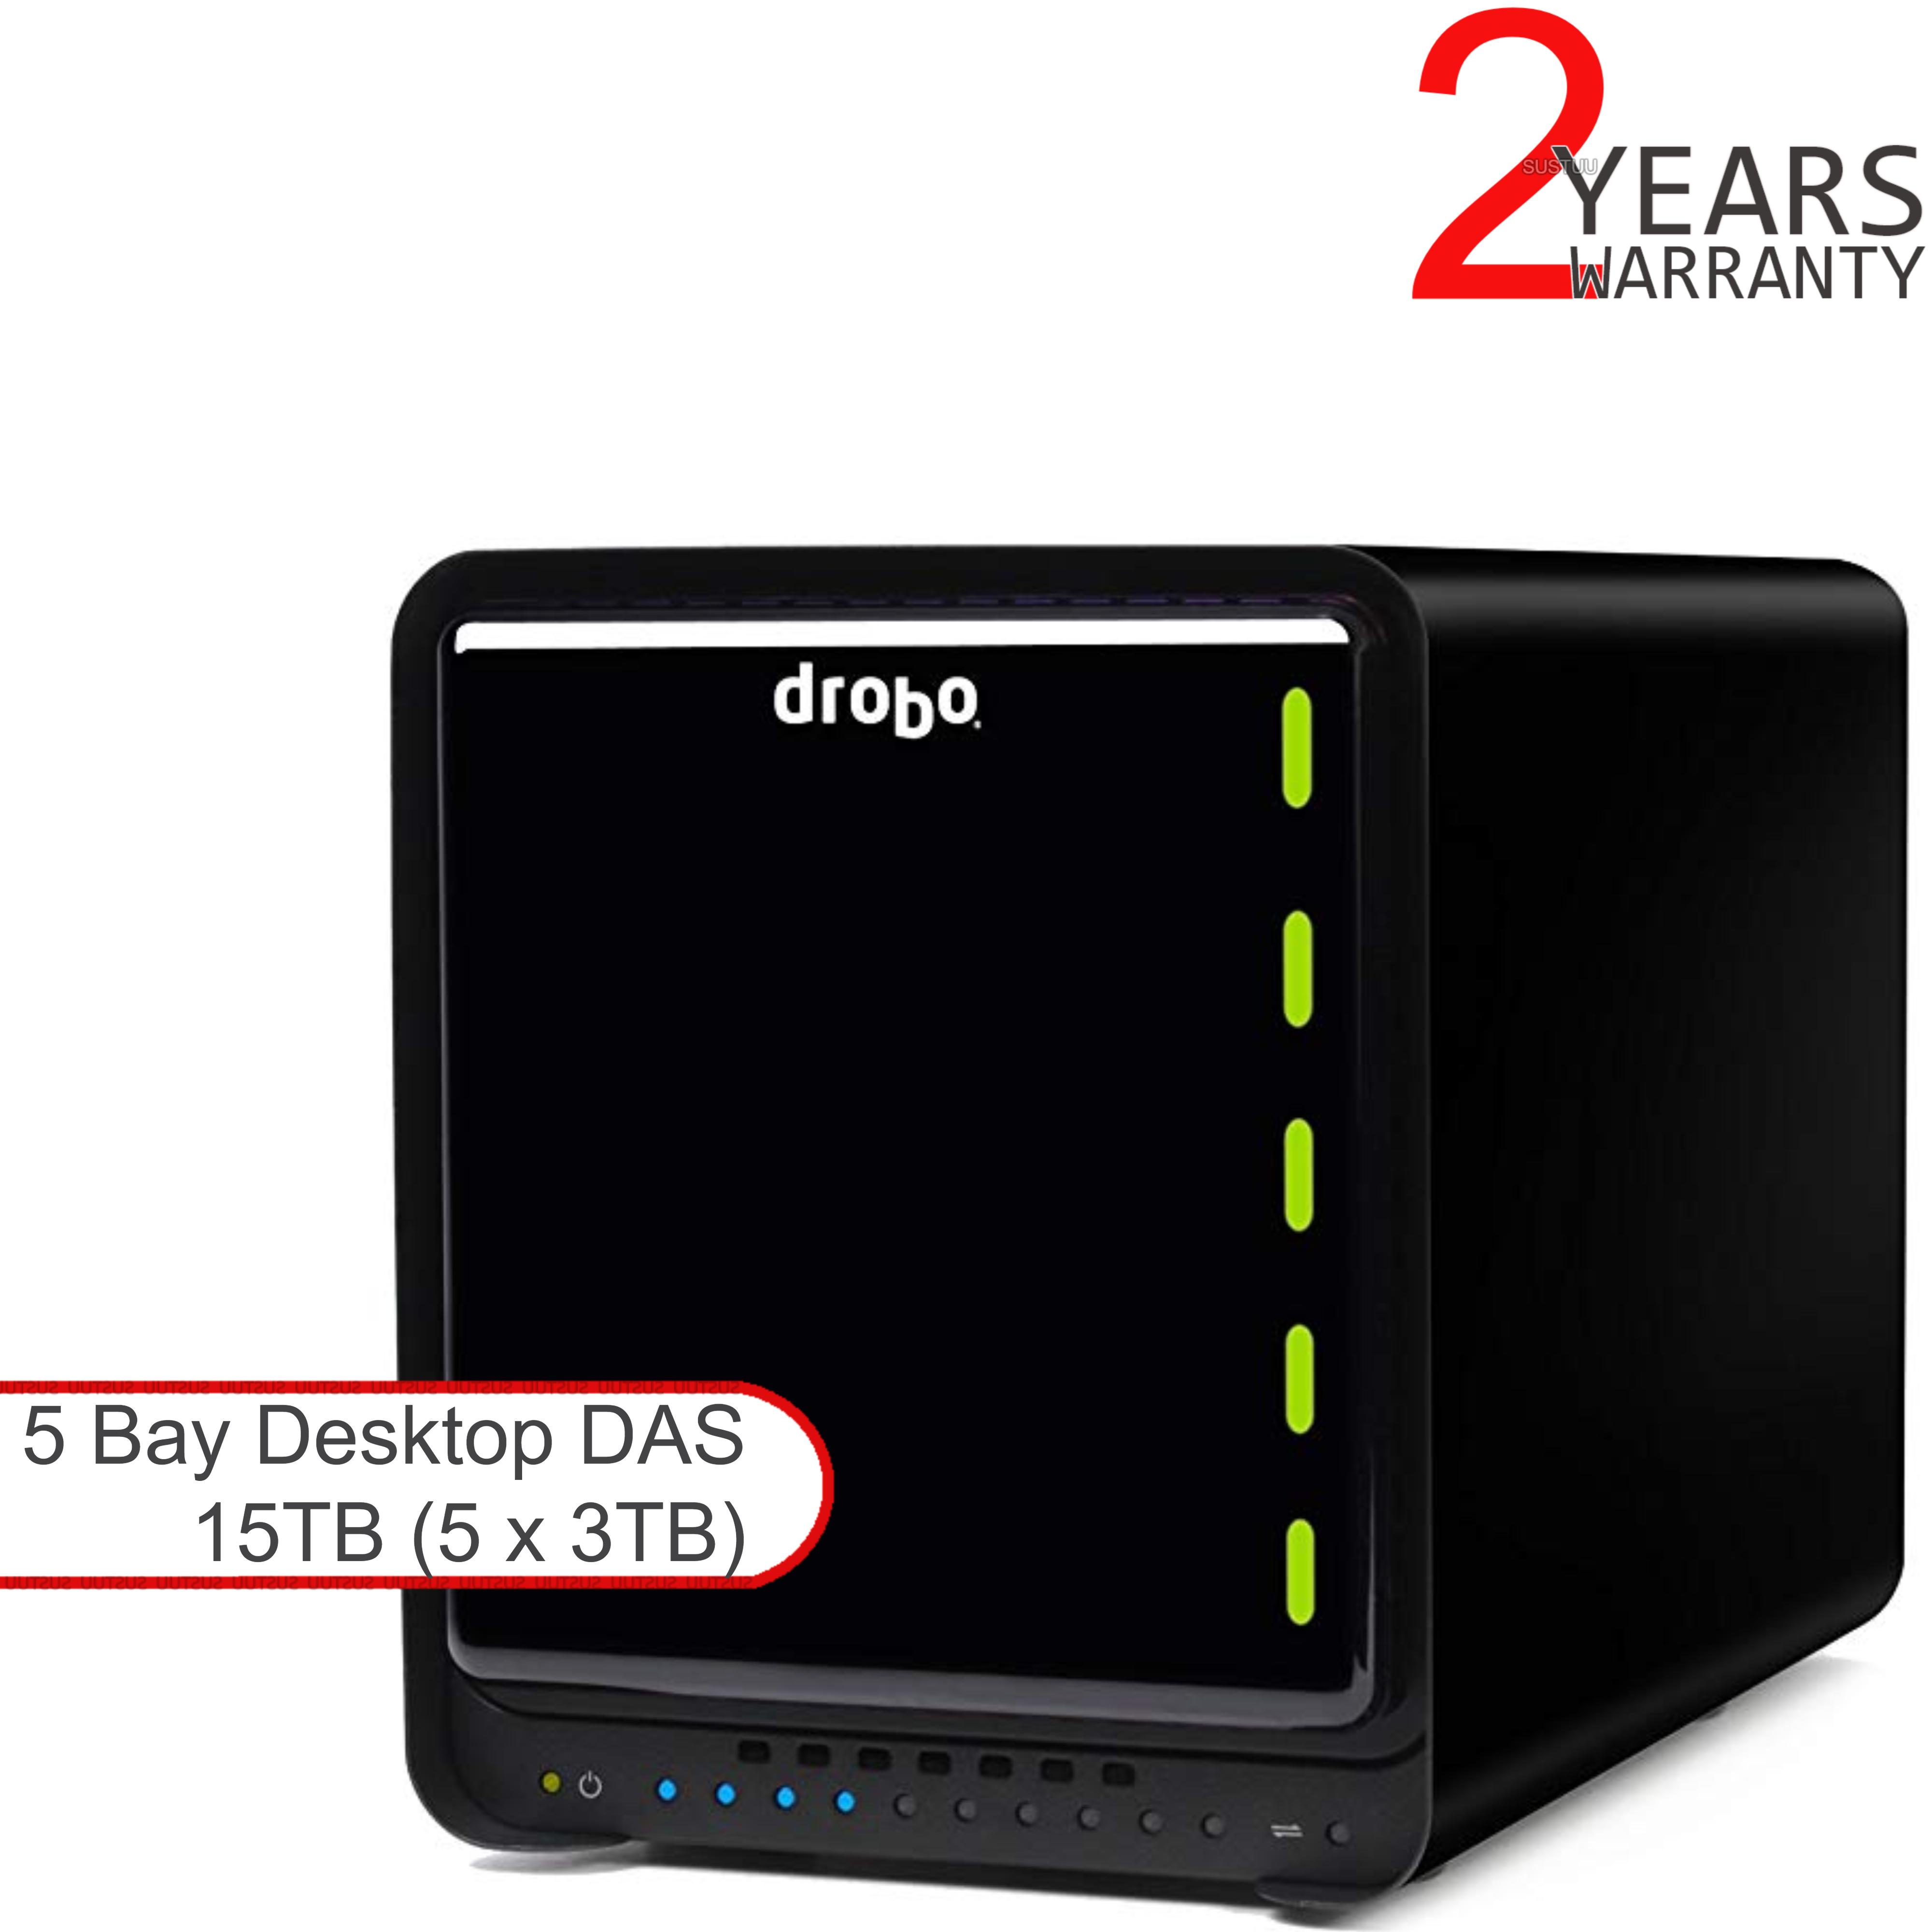 Drobo DDR4A31 15TB (5x3TB WD RED) 5 Bay DAS|Secure Storage Device|USB 3.0|Type-C